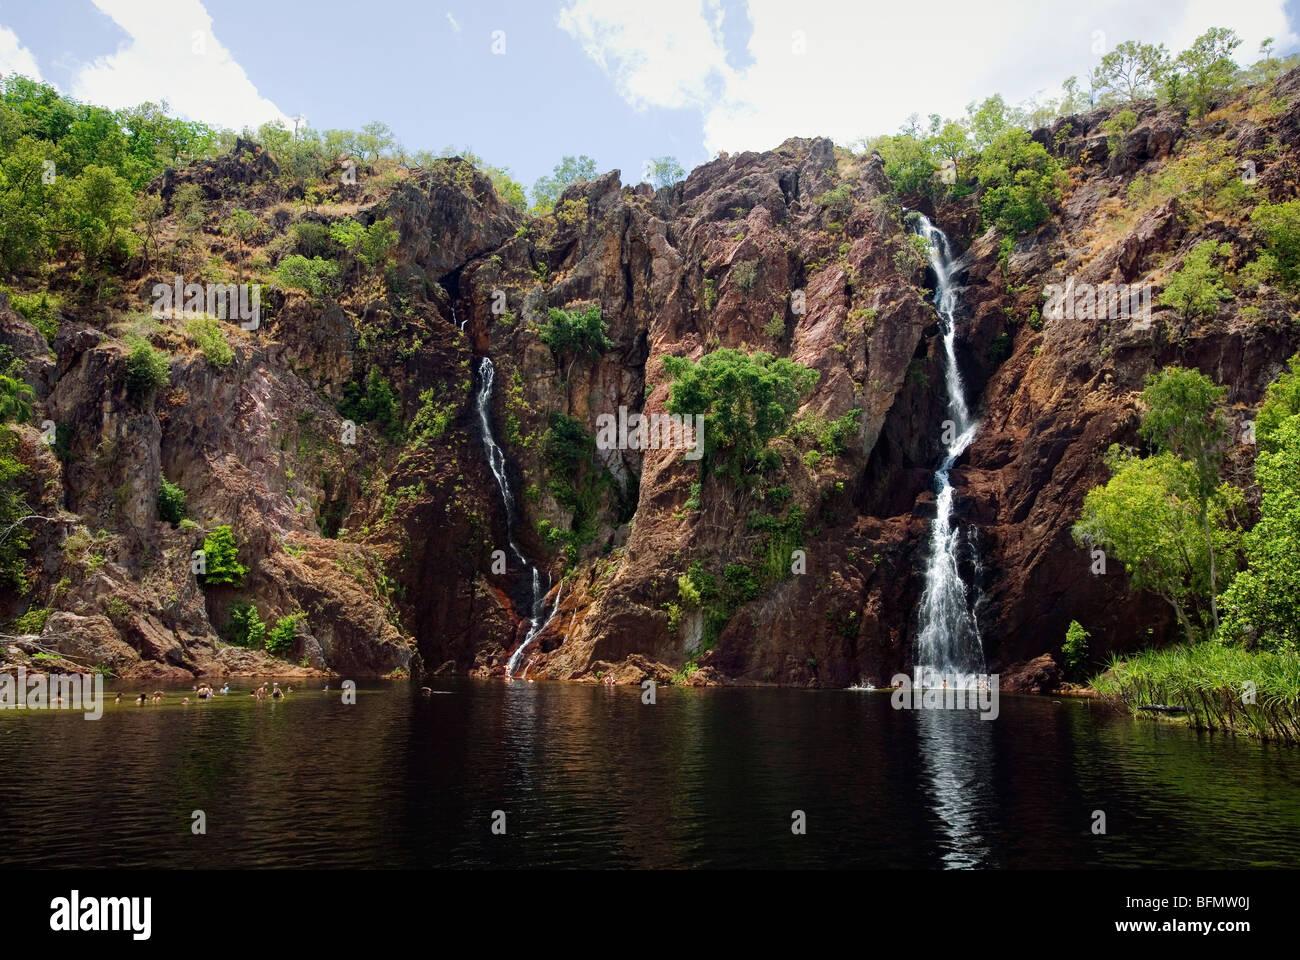 Australia, Northern Territory, Litchfield National Park.   Wangi Falls.(PR) - Stock Image